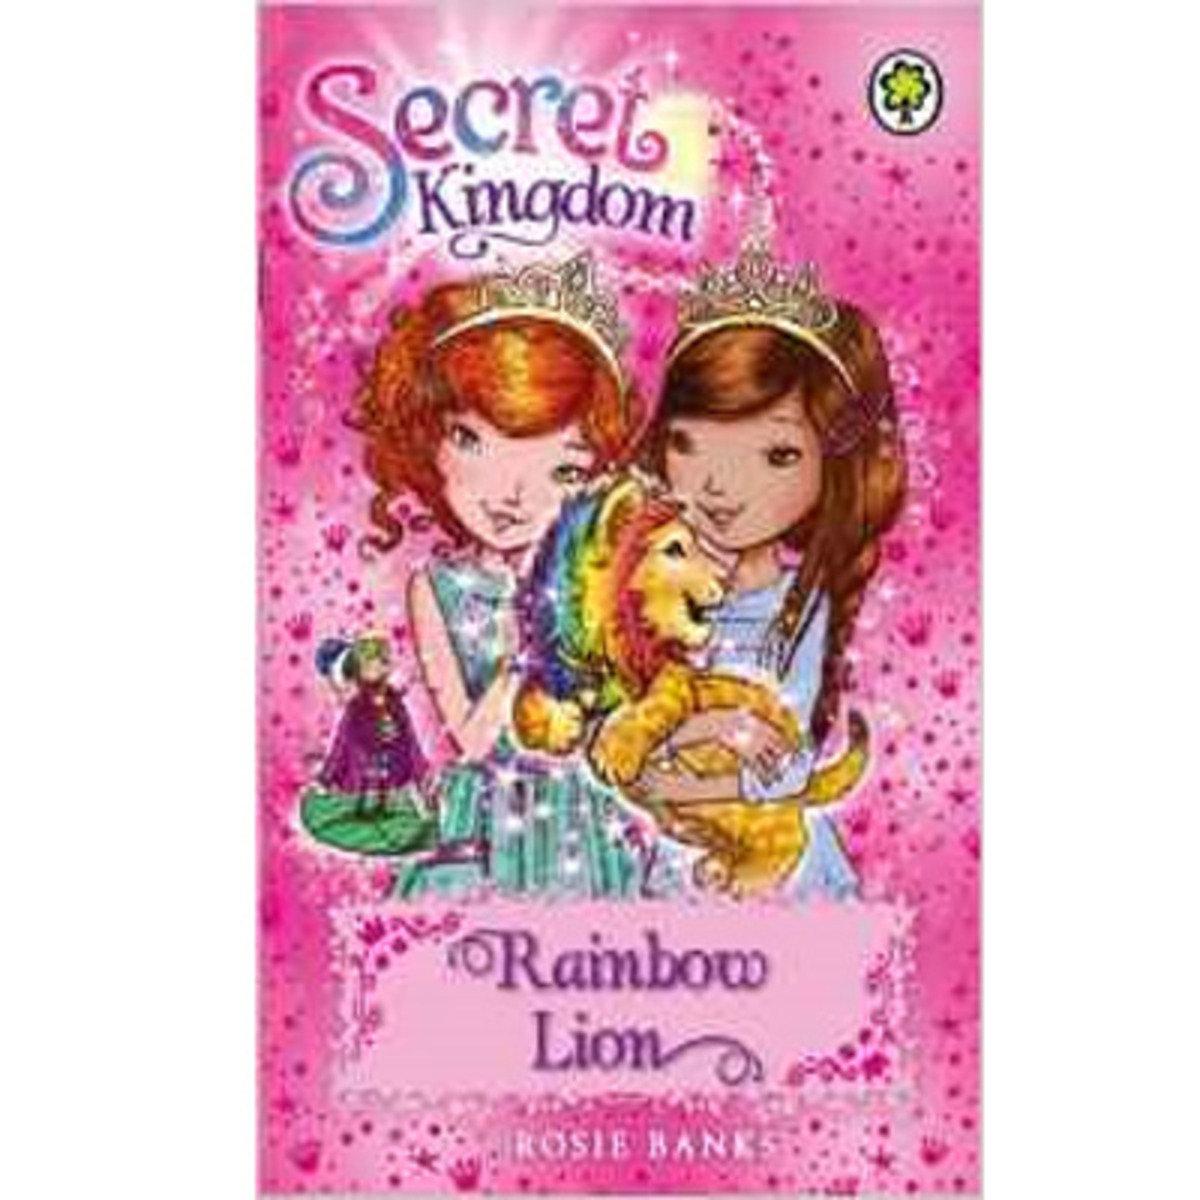 SECRET KINGDOM #22 RAINBOW LION 9781408329030